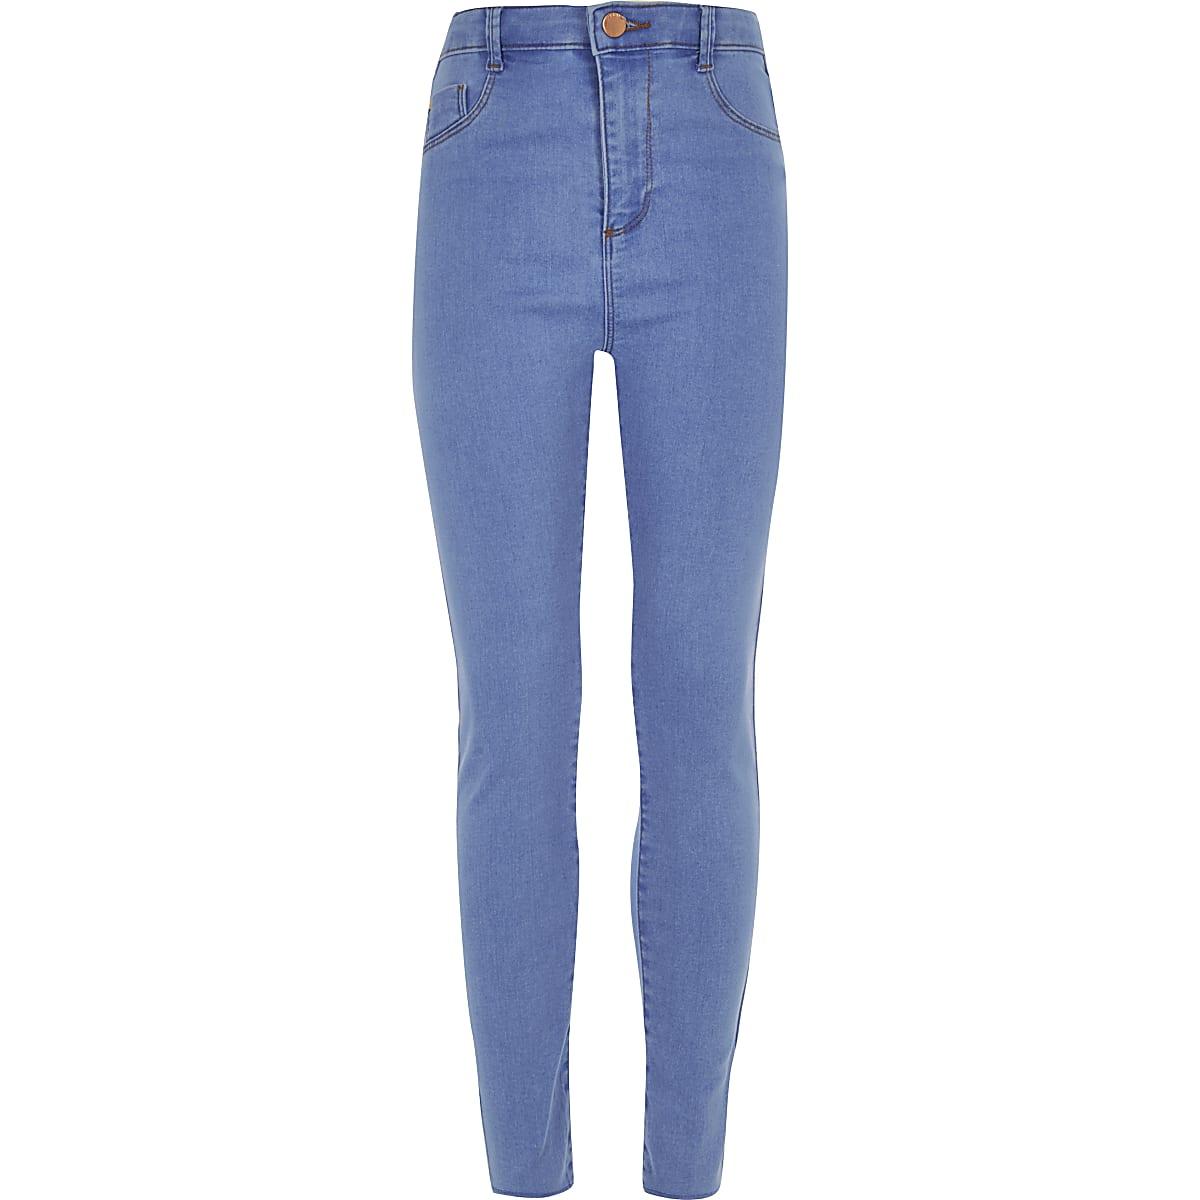 Girls blue Molly high waisted jeggings